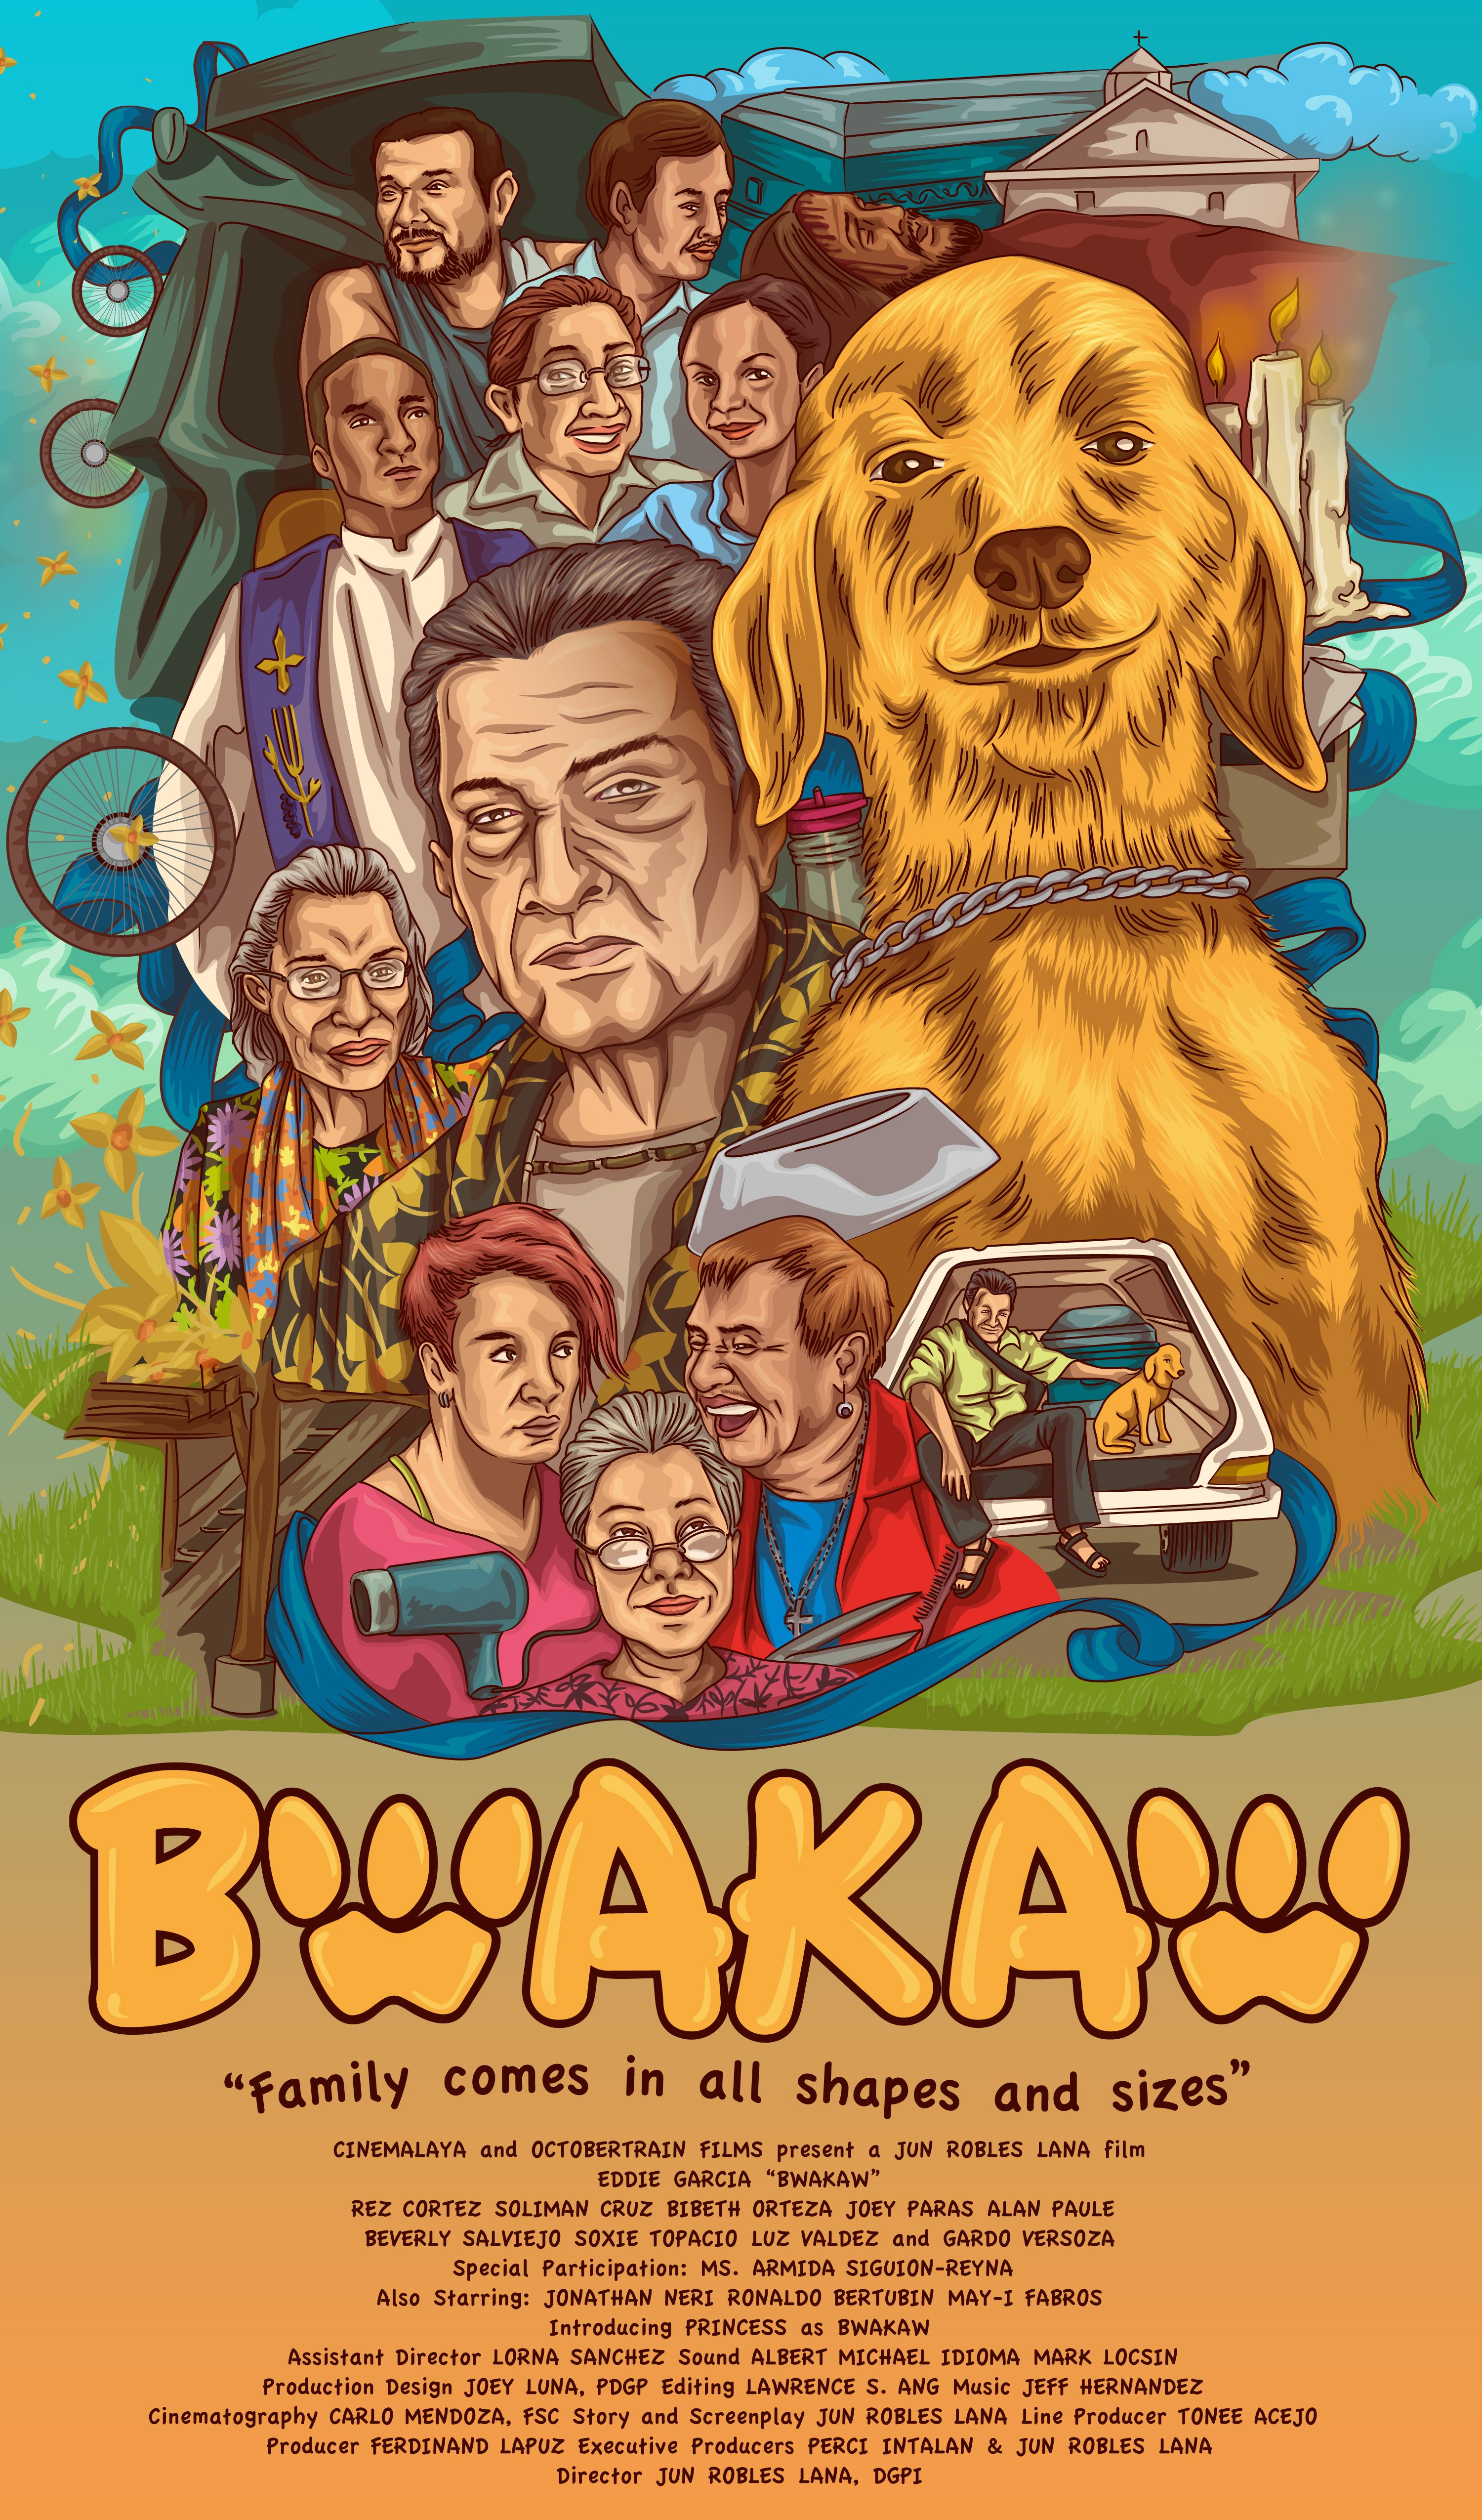 Bwakaw (2012) movie indiefilm Tagalog Philippines